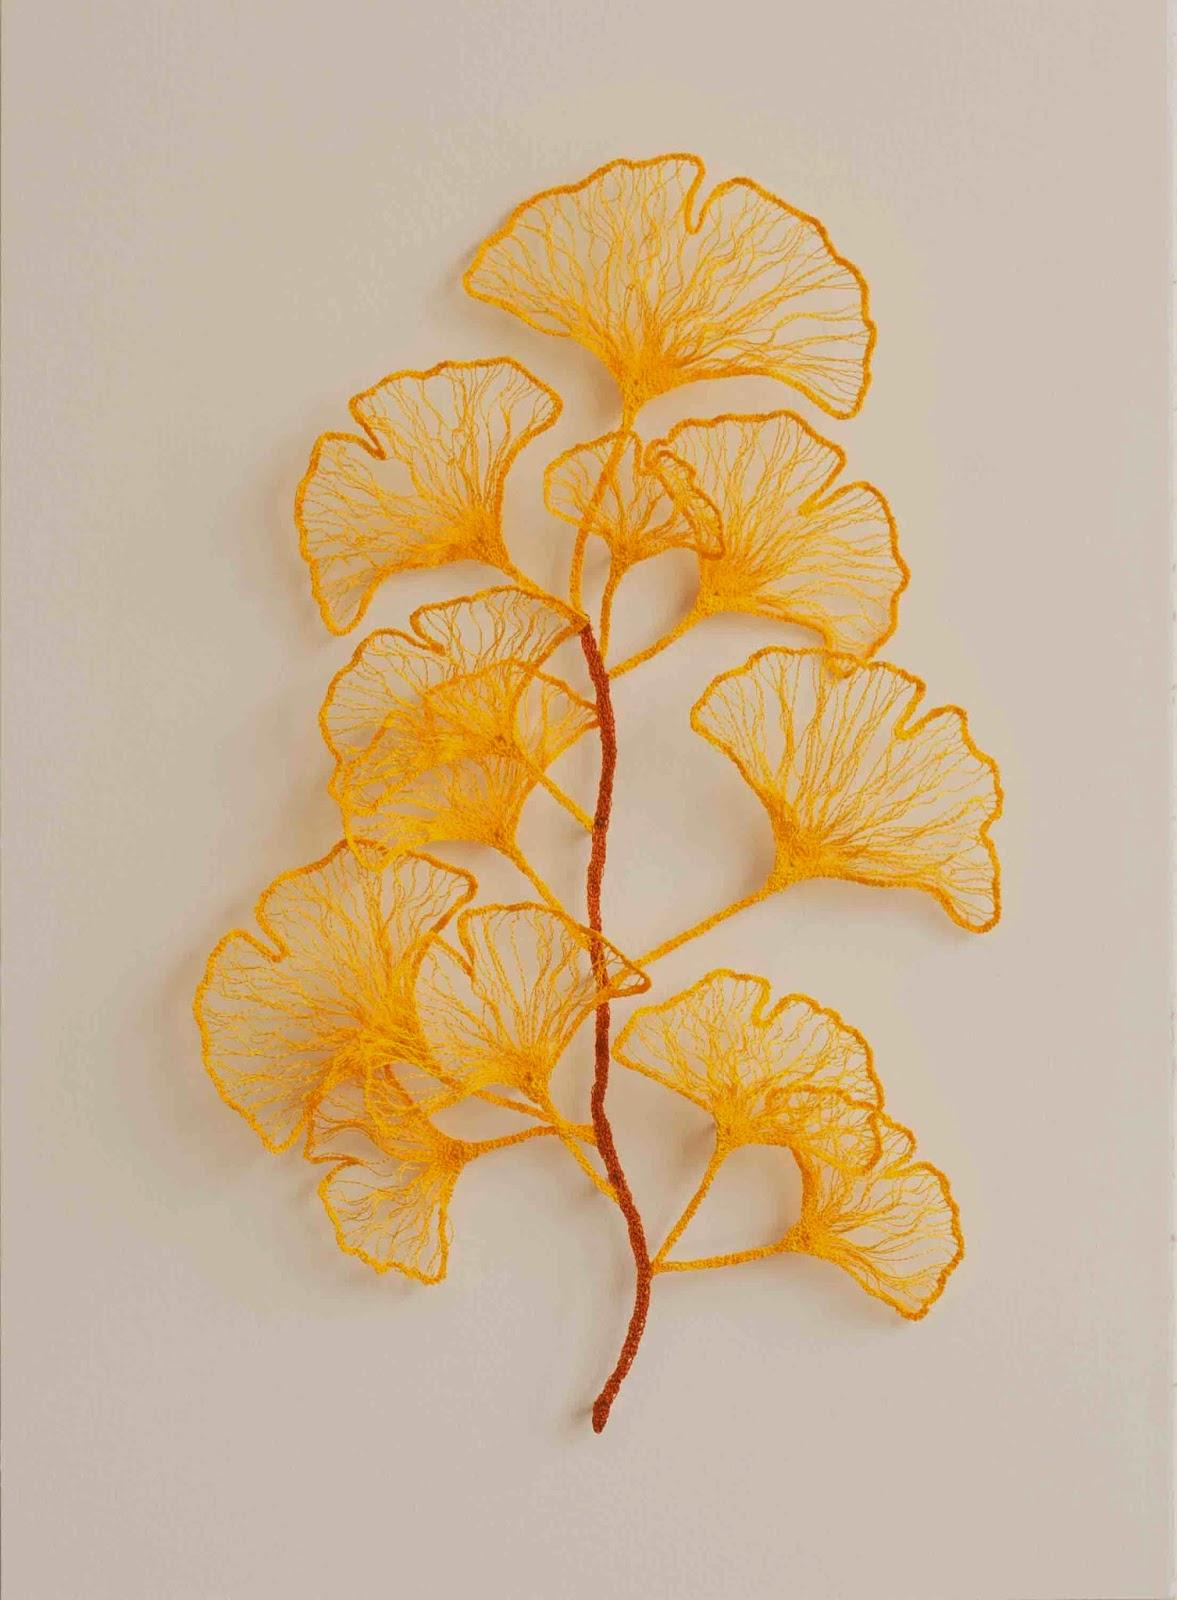 'Ginkgo branch' - Meredith Woolnough